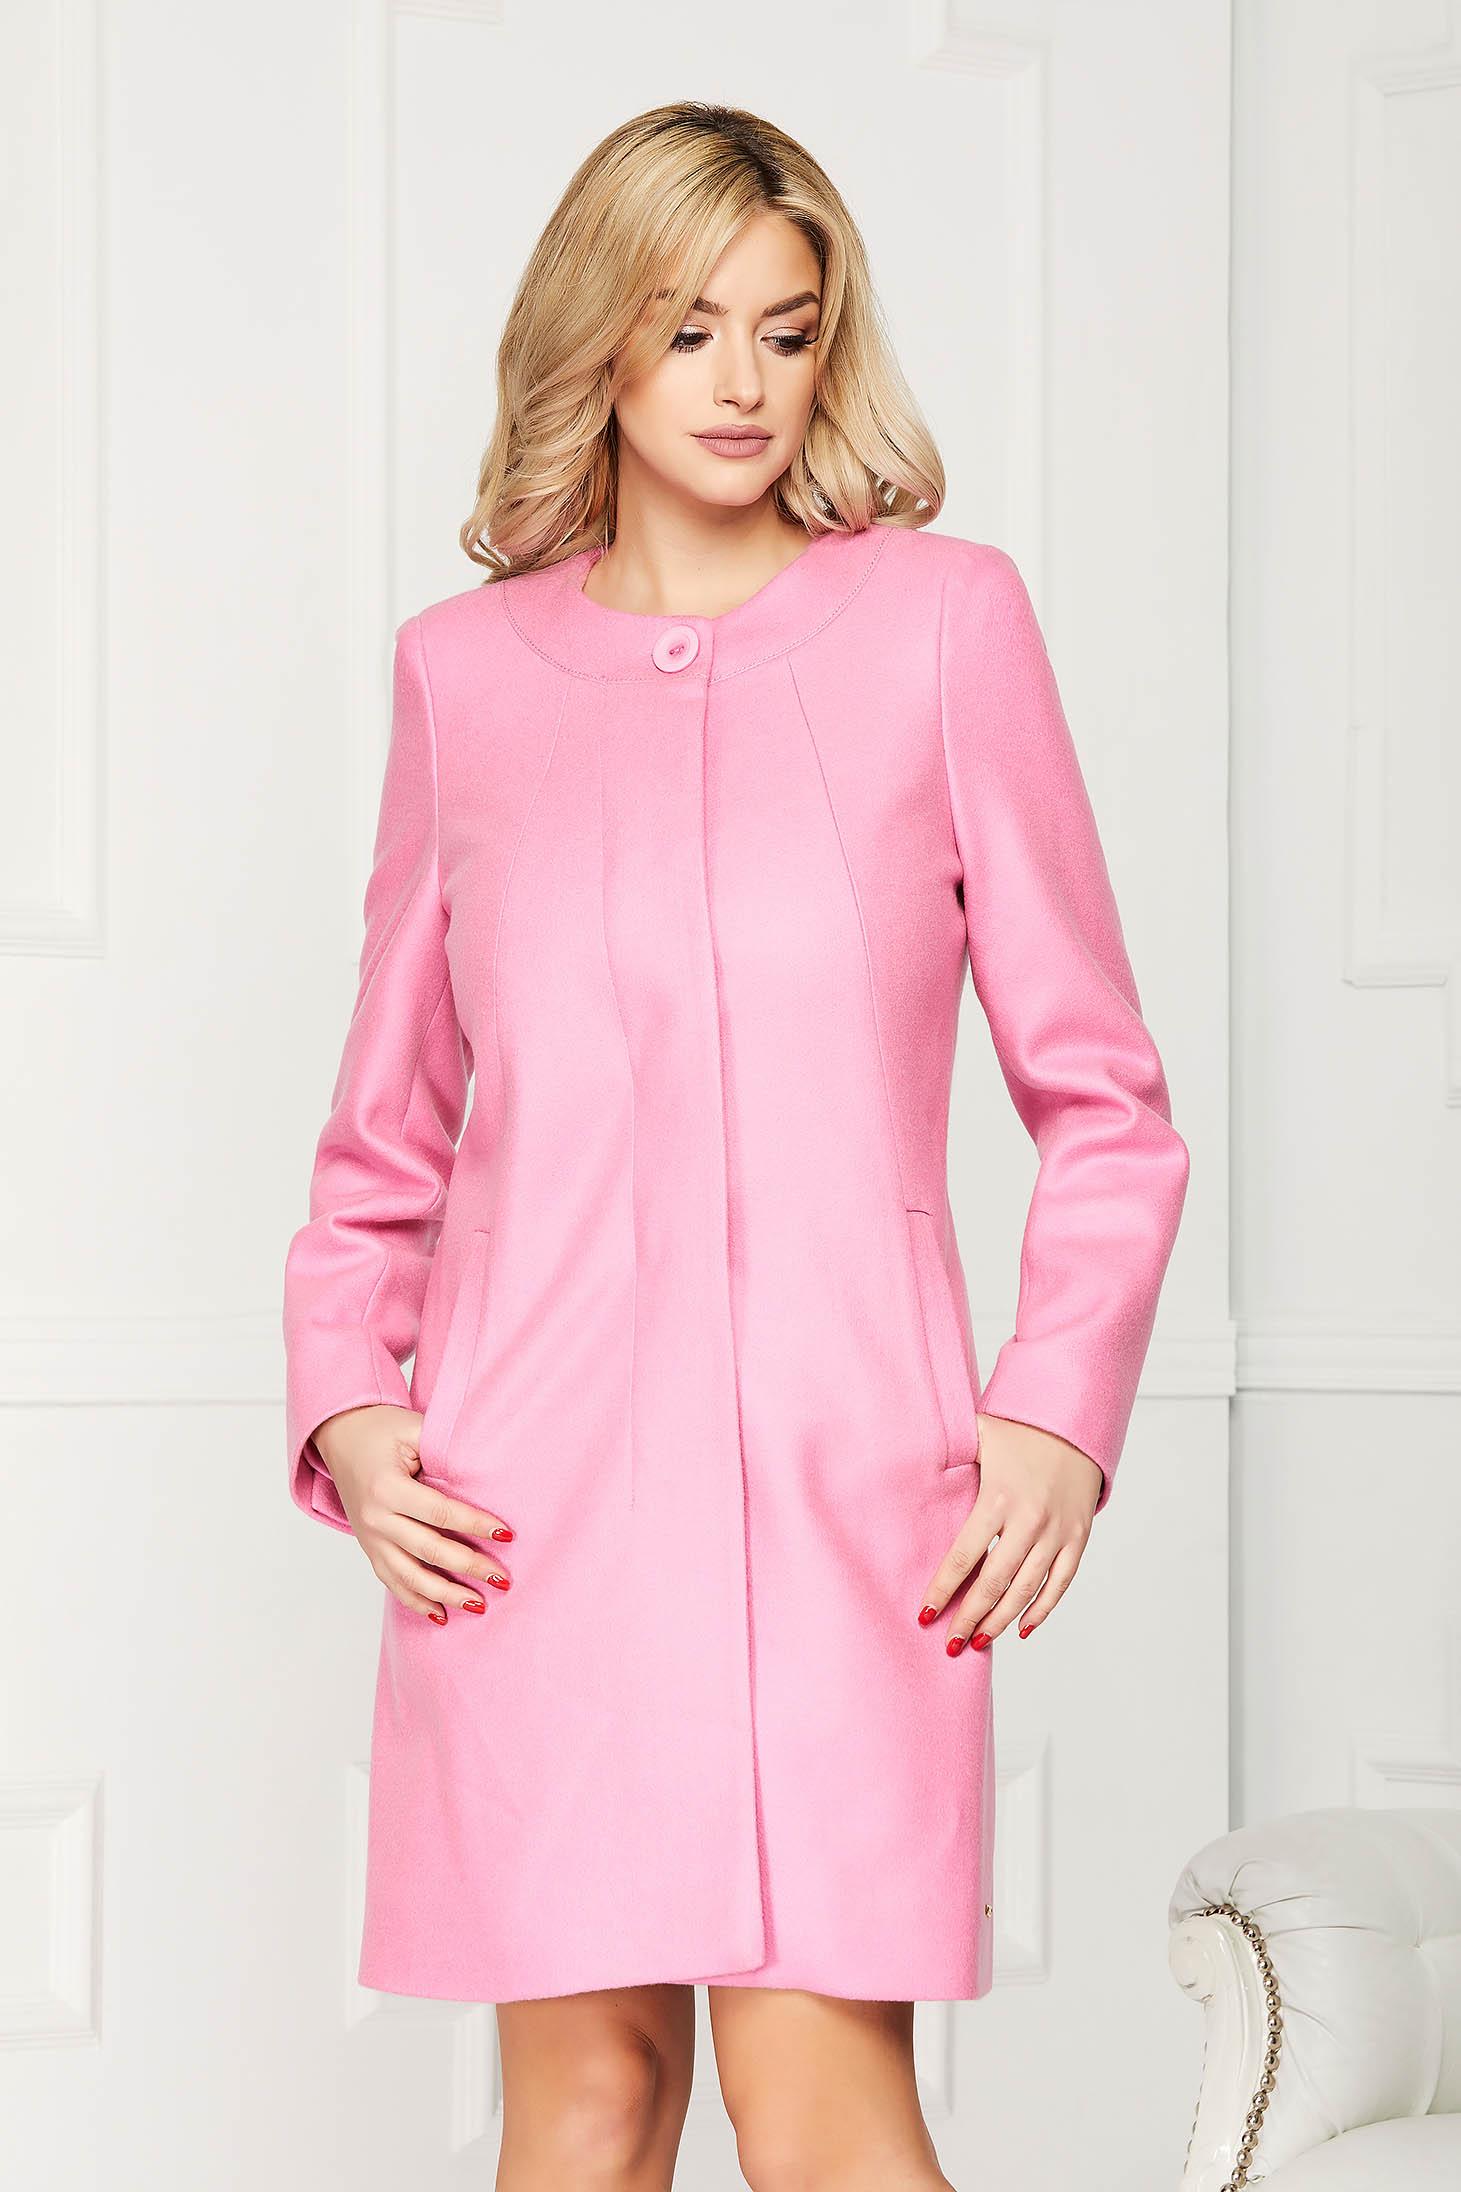 Trench roz deschis elegant scurt din lana cu un croi drept si buzunare